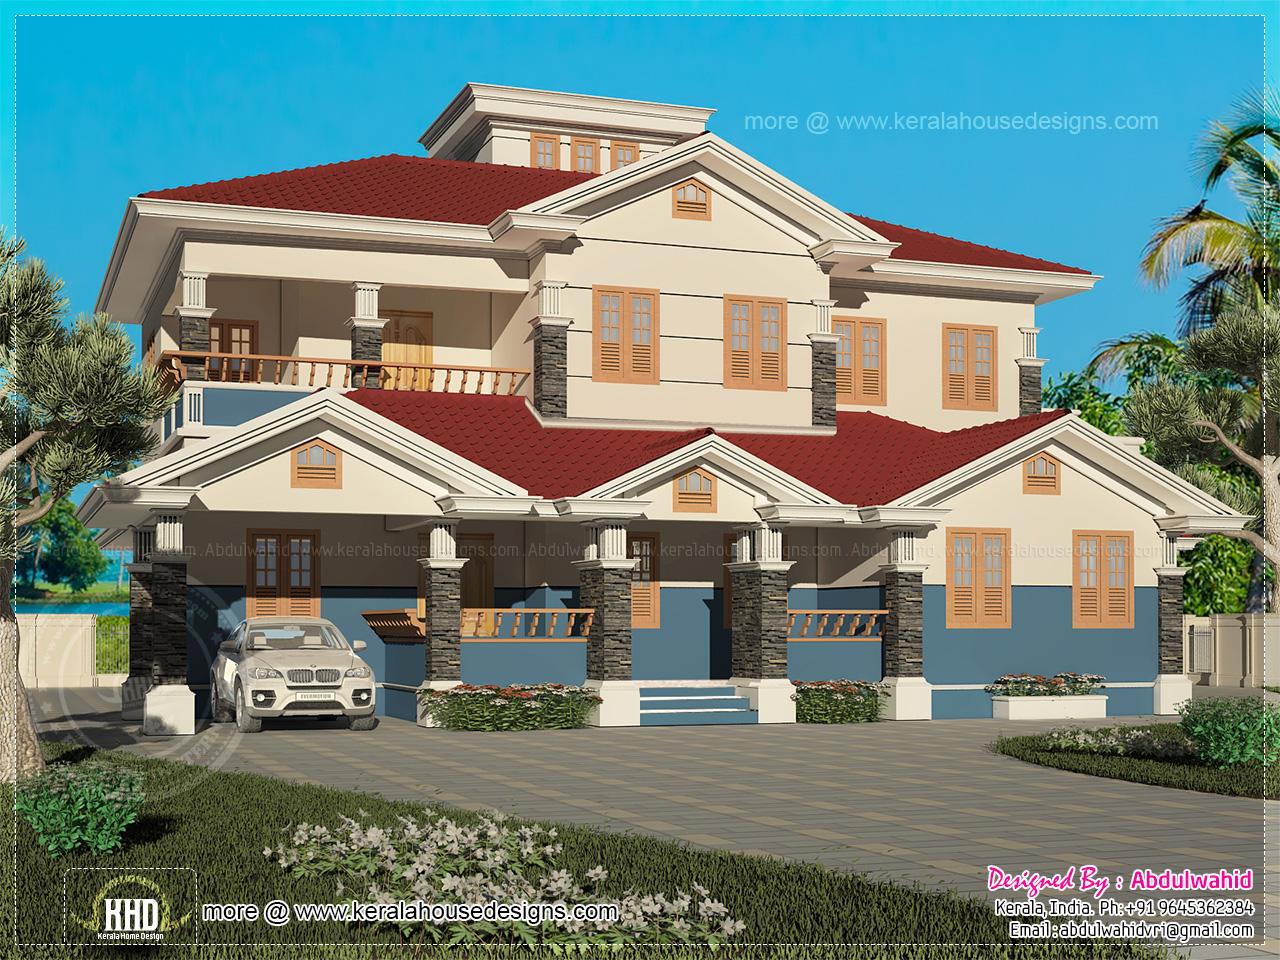 232 square meter 4 bedroom villa design kerala home for 2500 to 3000 sq ft homes